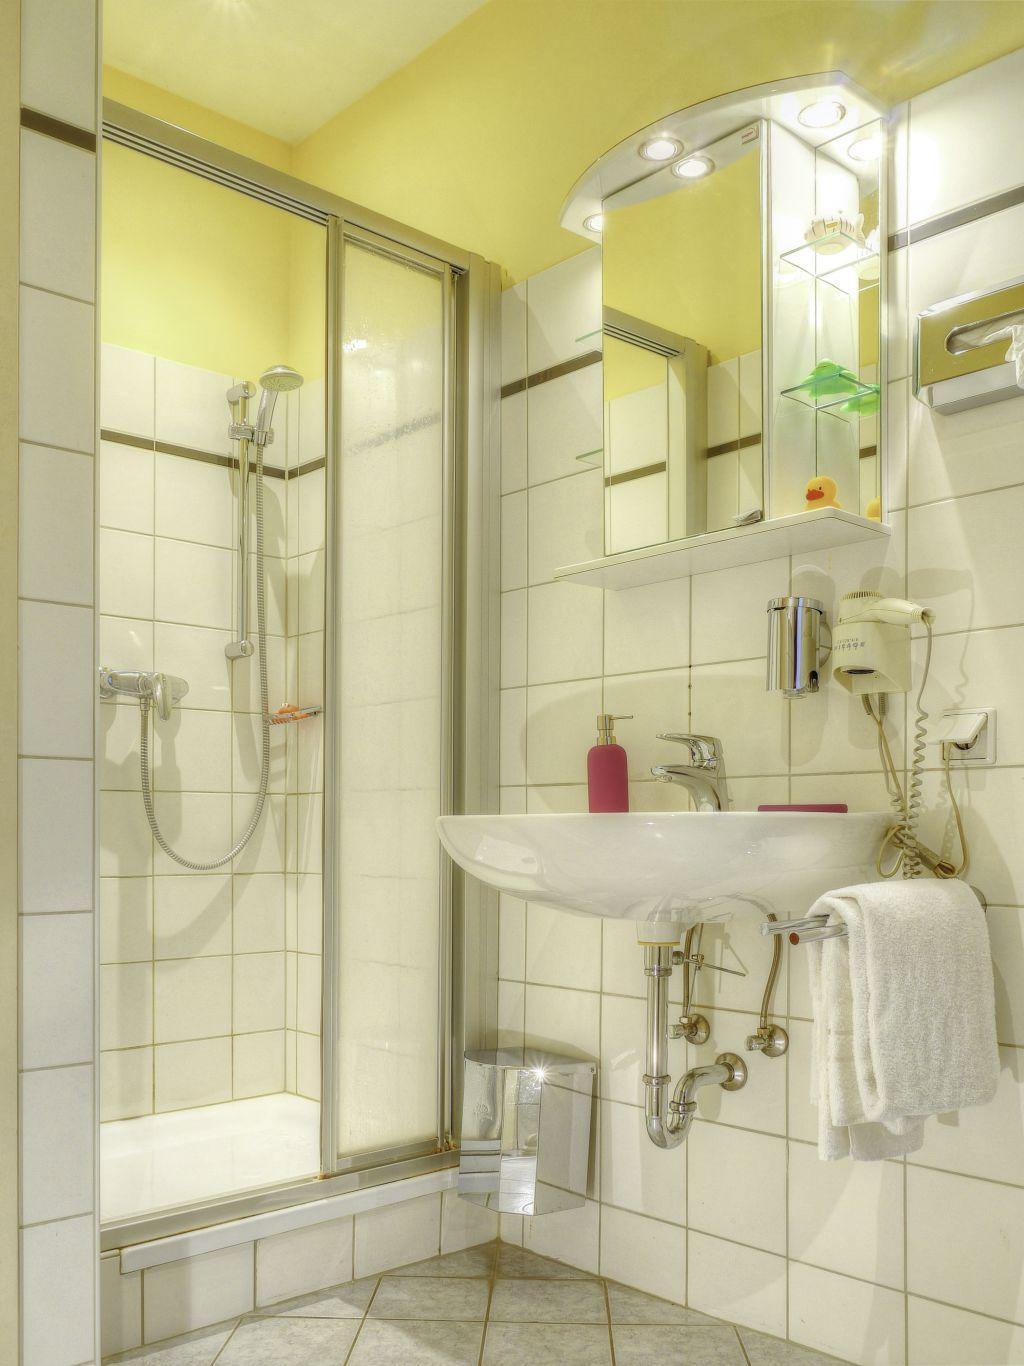 image 5 furnished 1 bedroom Apartment for rent in Josefstadt, Vienna